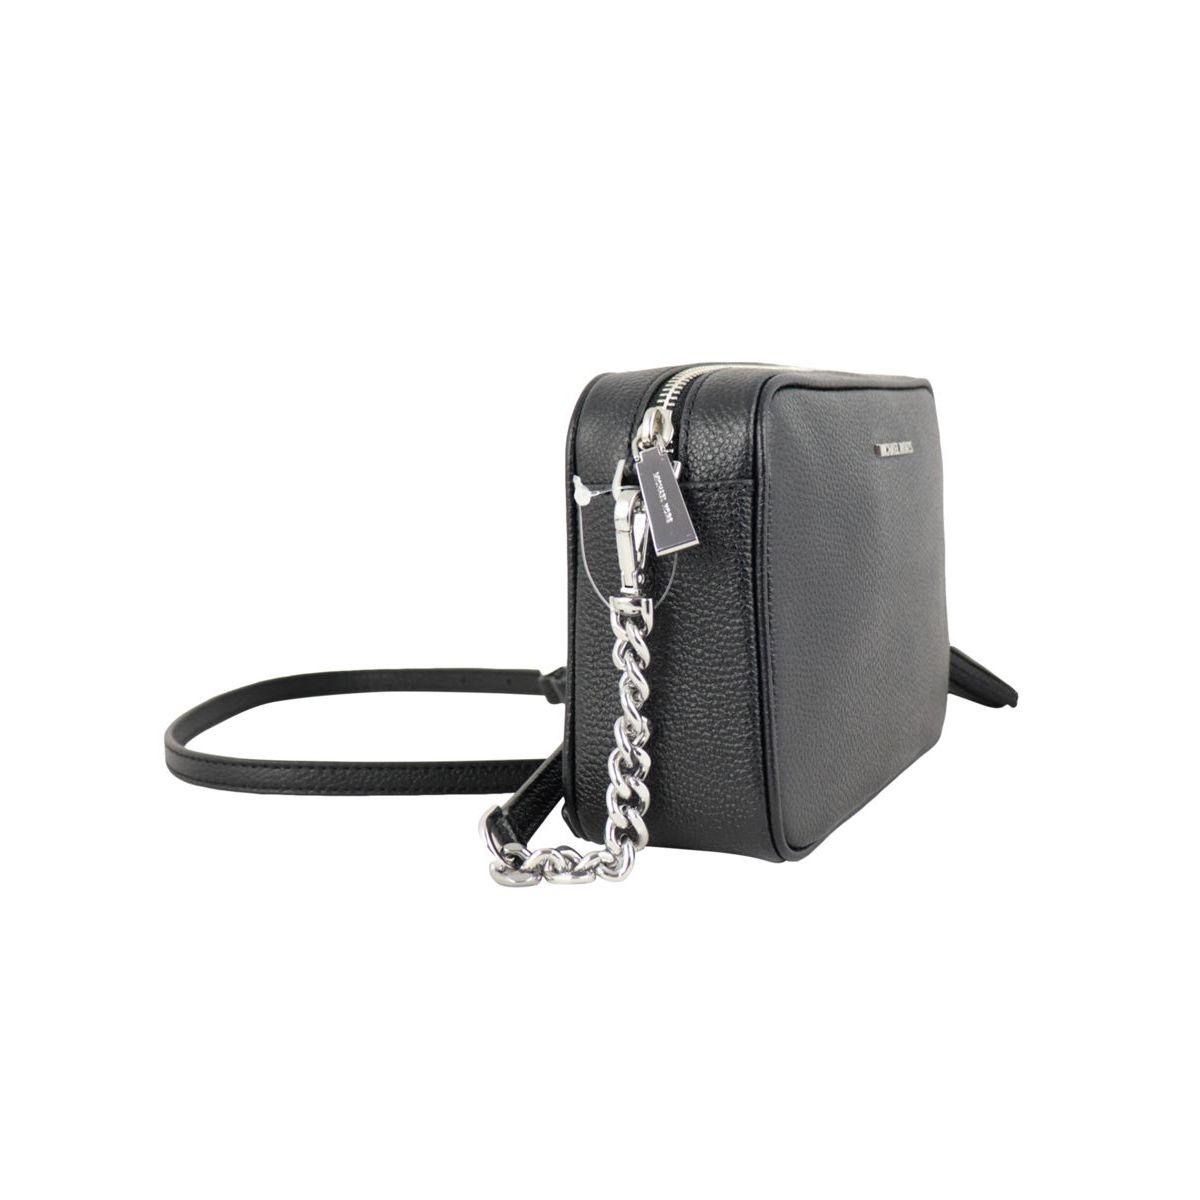 Medium camera bag in textured leather Black Michael Kors